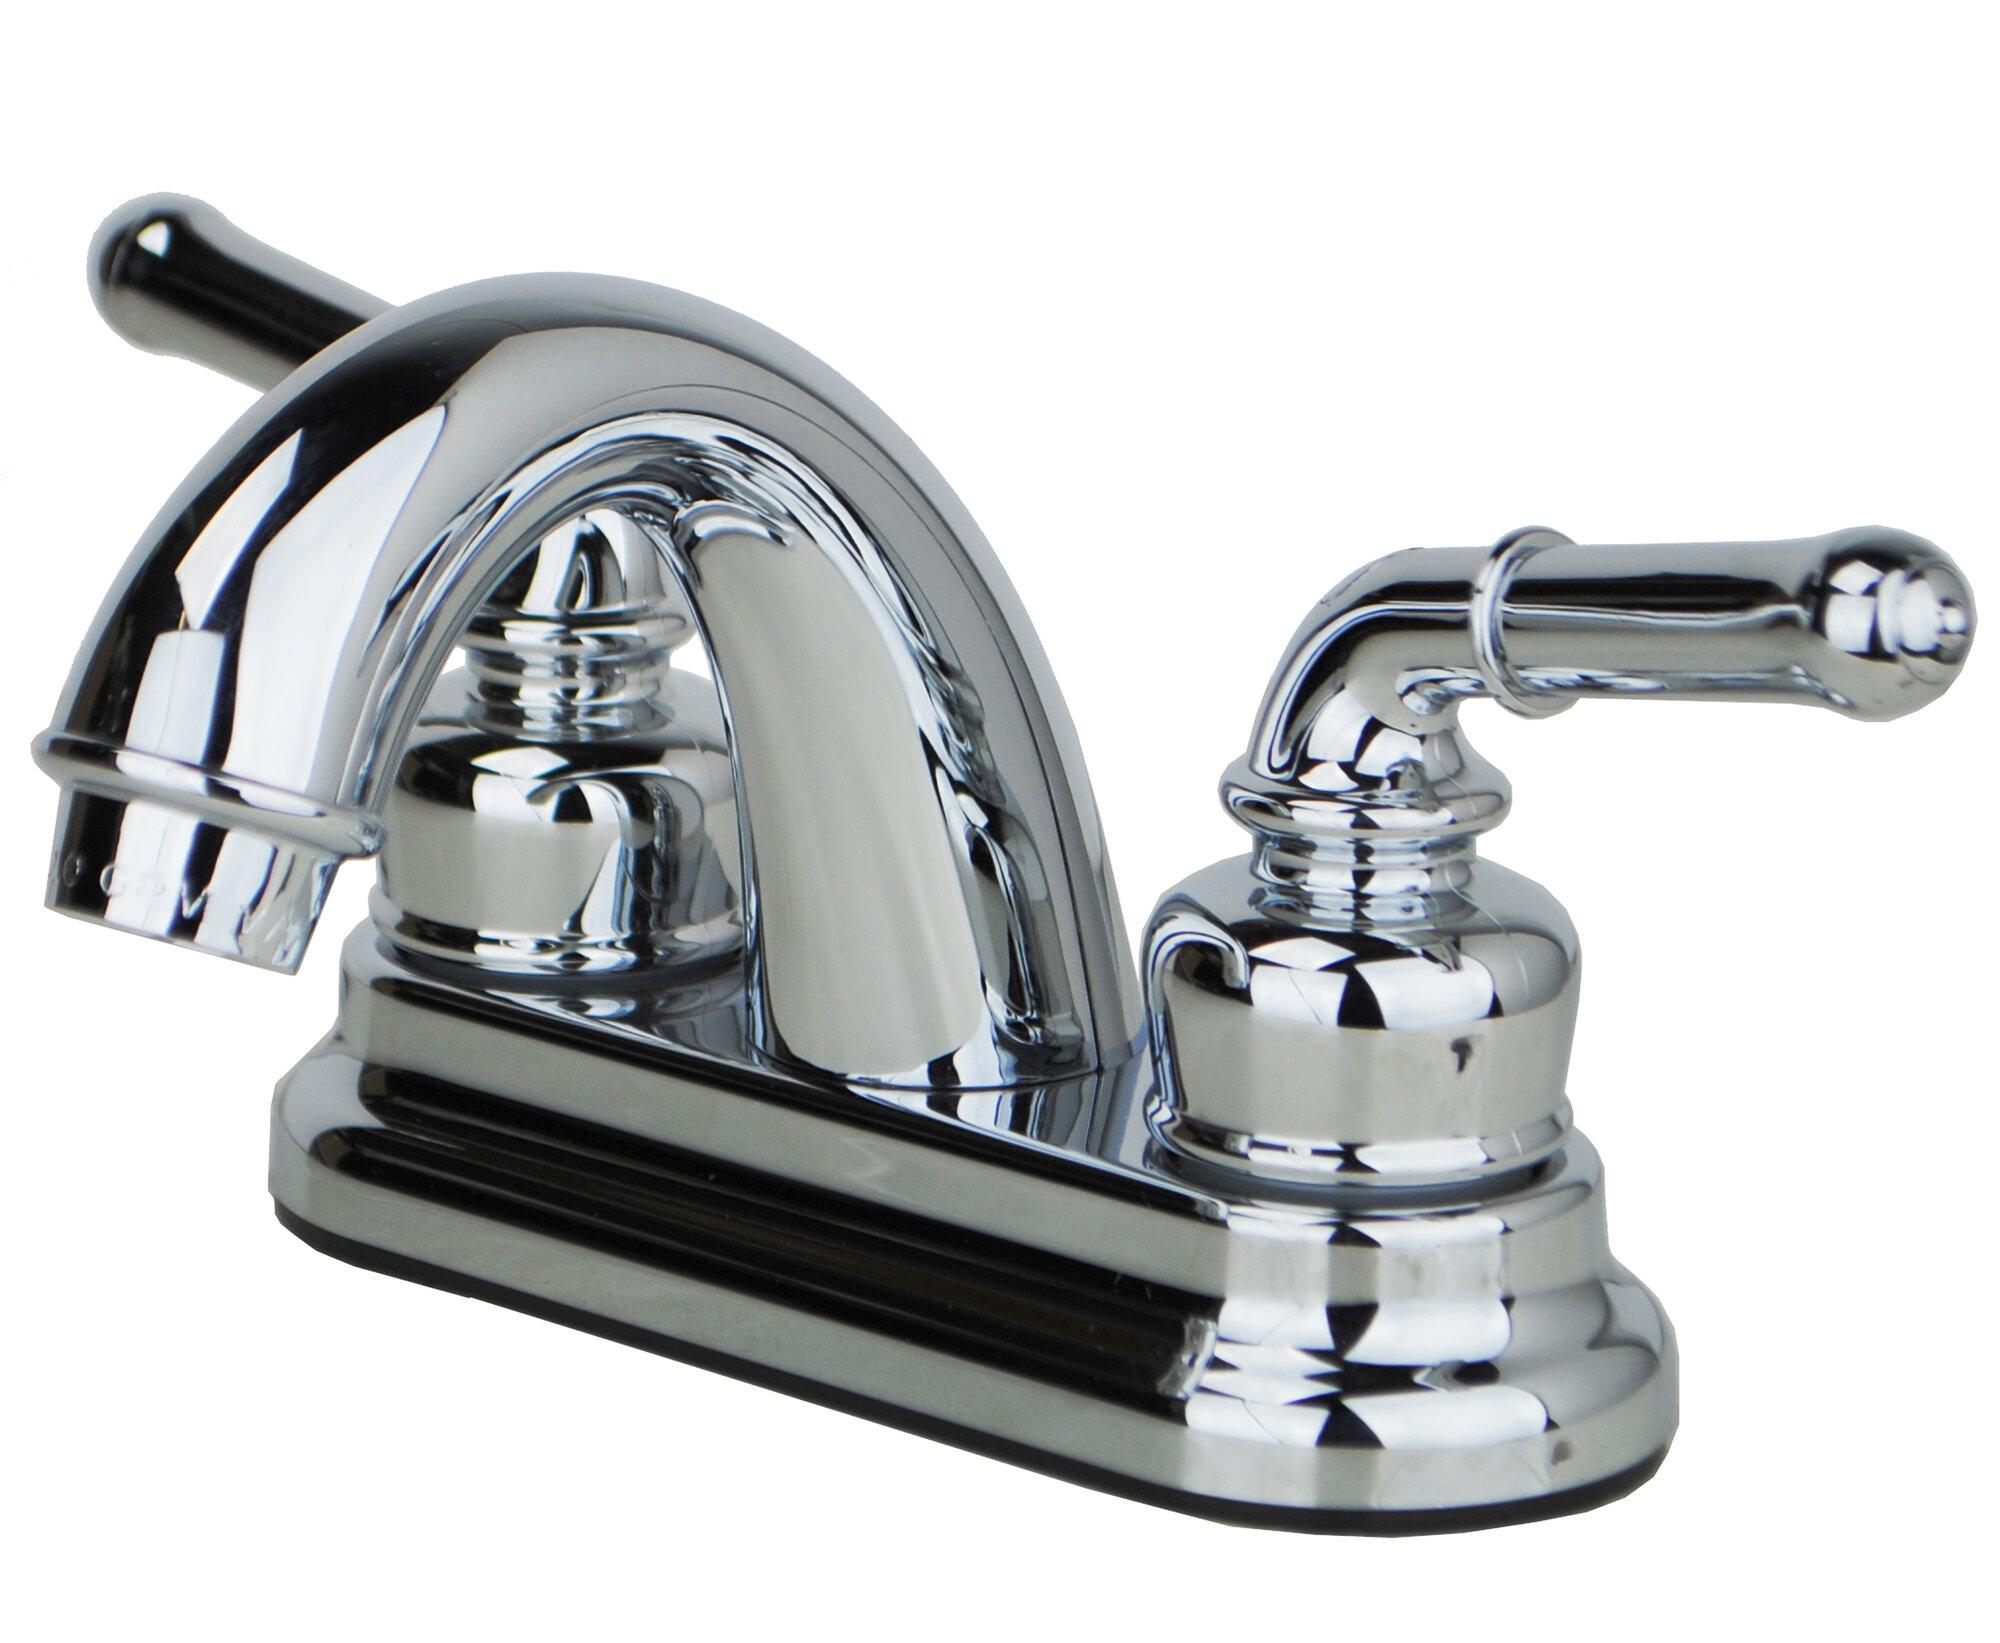 builders shoppe rv mobile home centerset lever handle bathroom faucet ebay. Black Bedroom Furniture Sets. Home Design Ideas